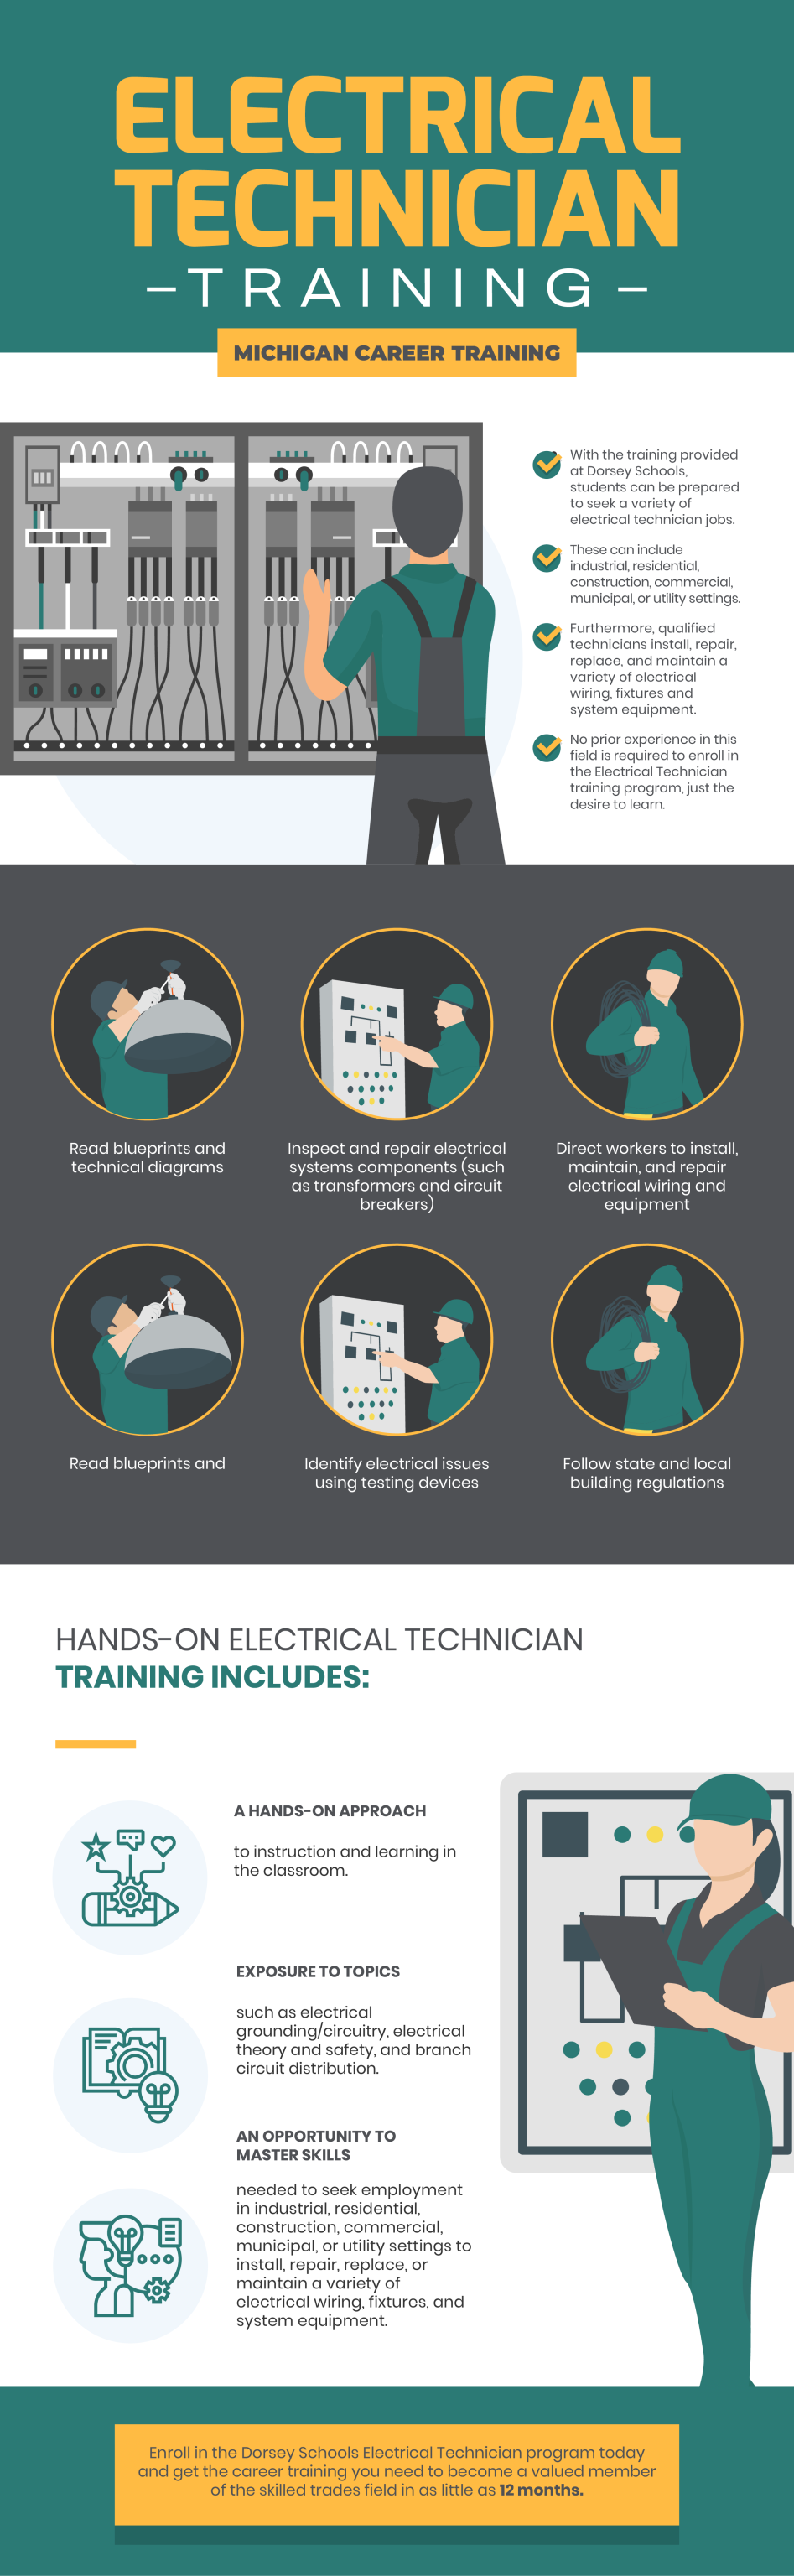 Electrical Technician Training – Michigan Career Training #infographic